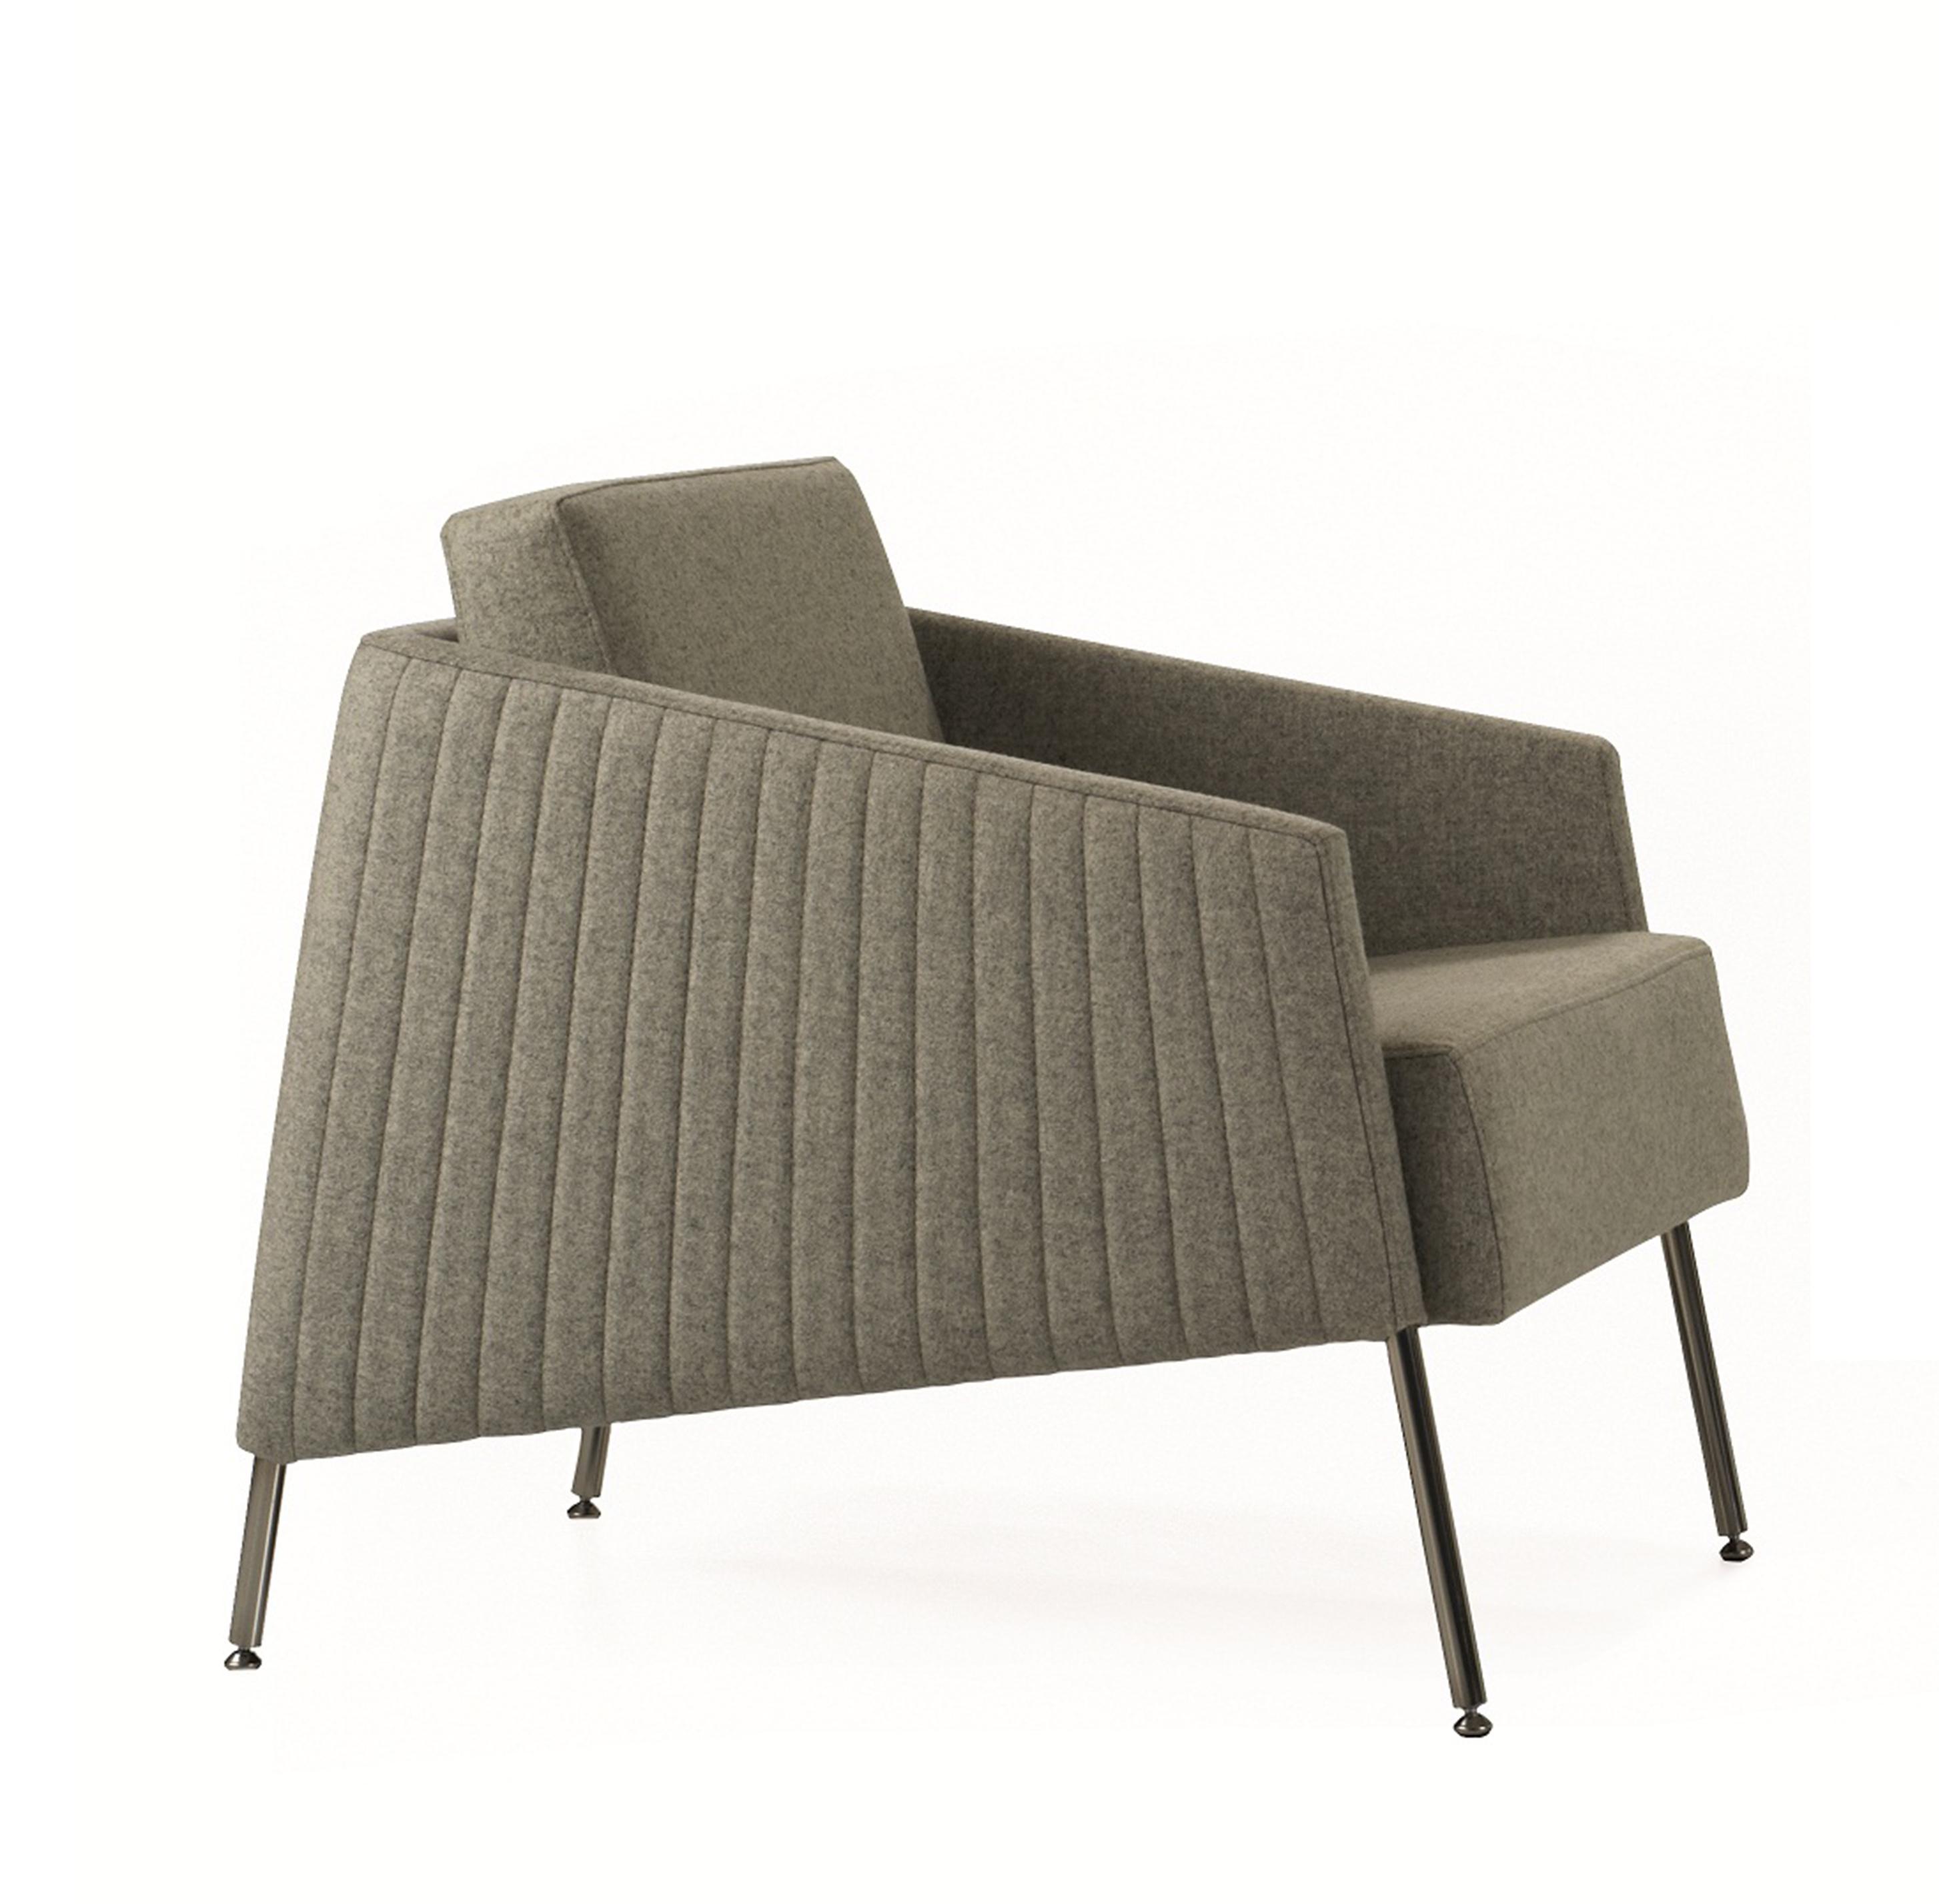 Ress Single Seat Sofa